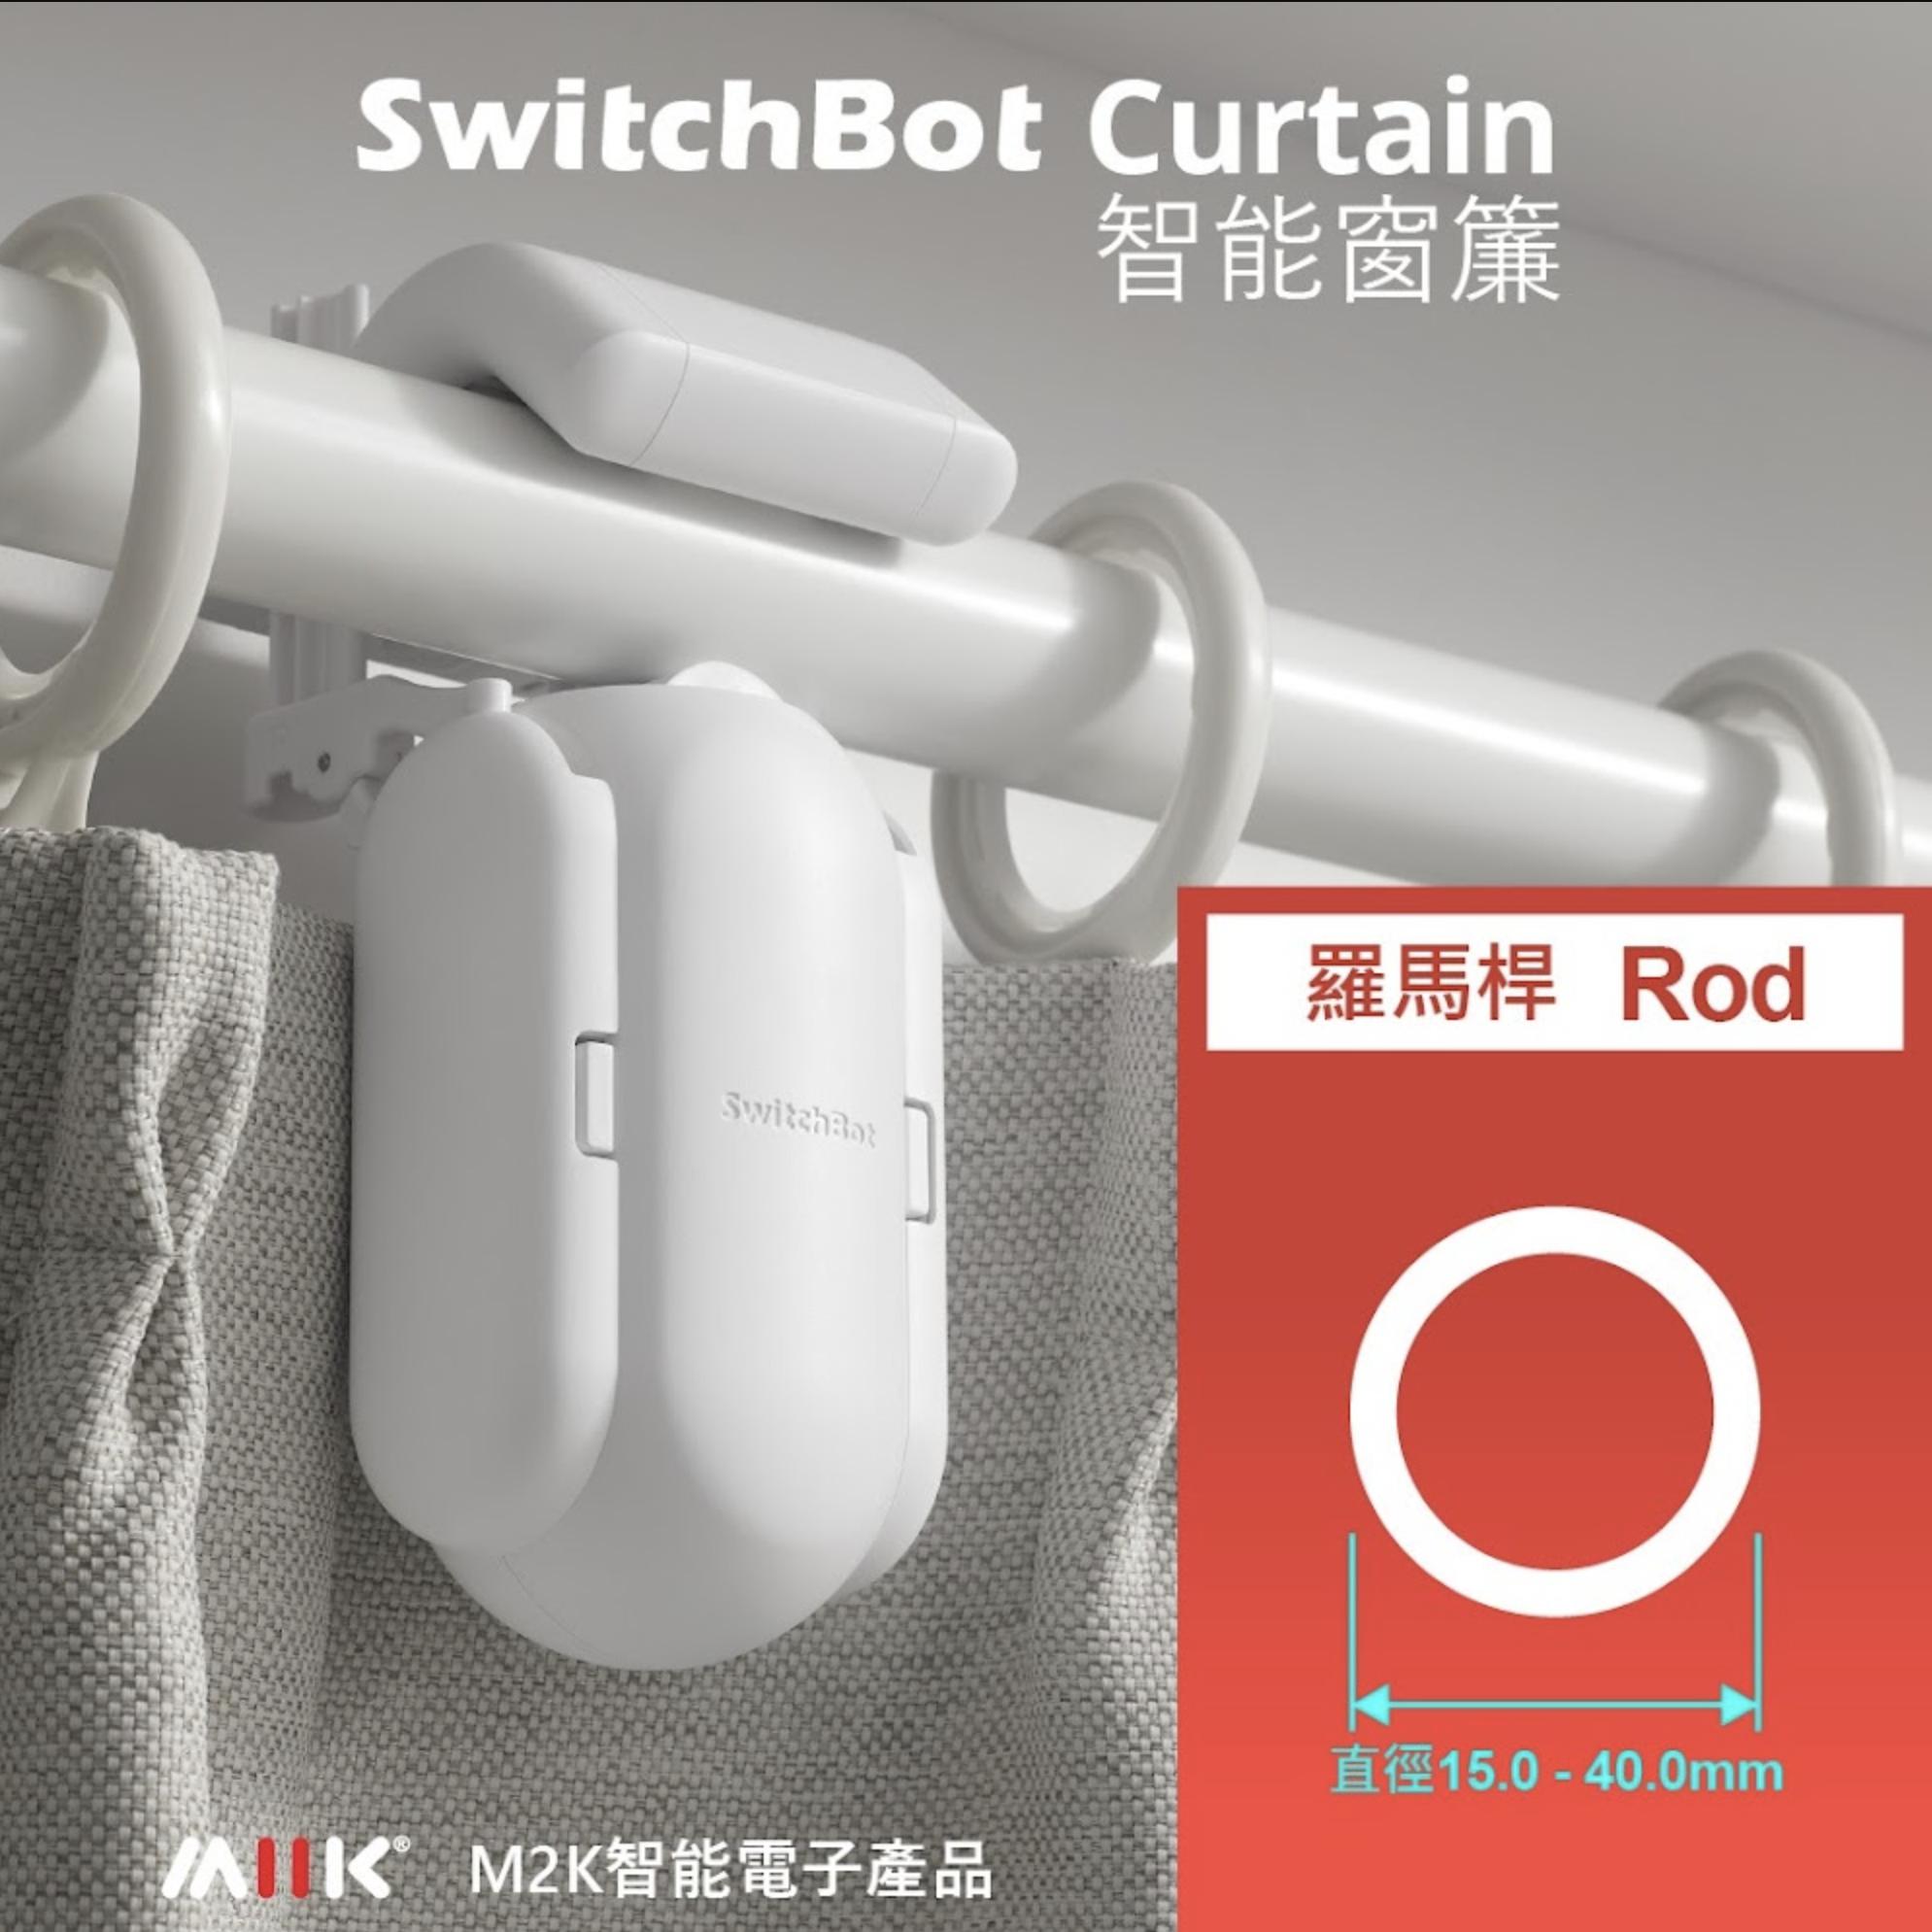 SwitchBot Curtain - 窗簾機器人 - ''杆''形軌道